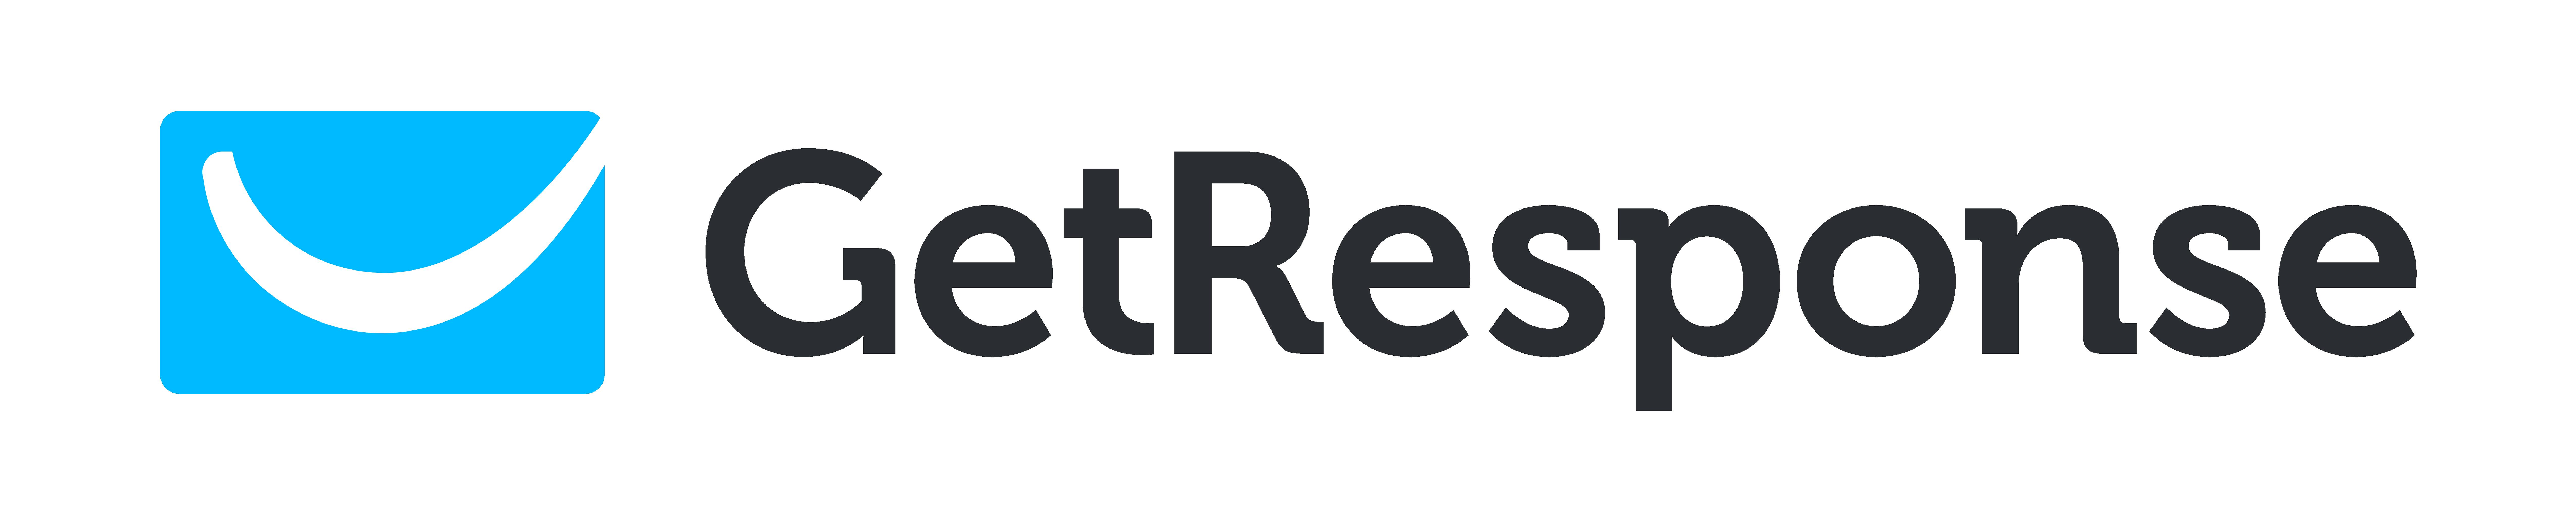 Get response partnerem Fundacji